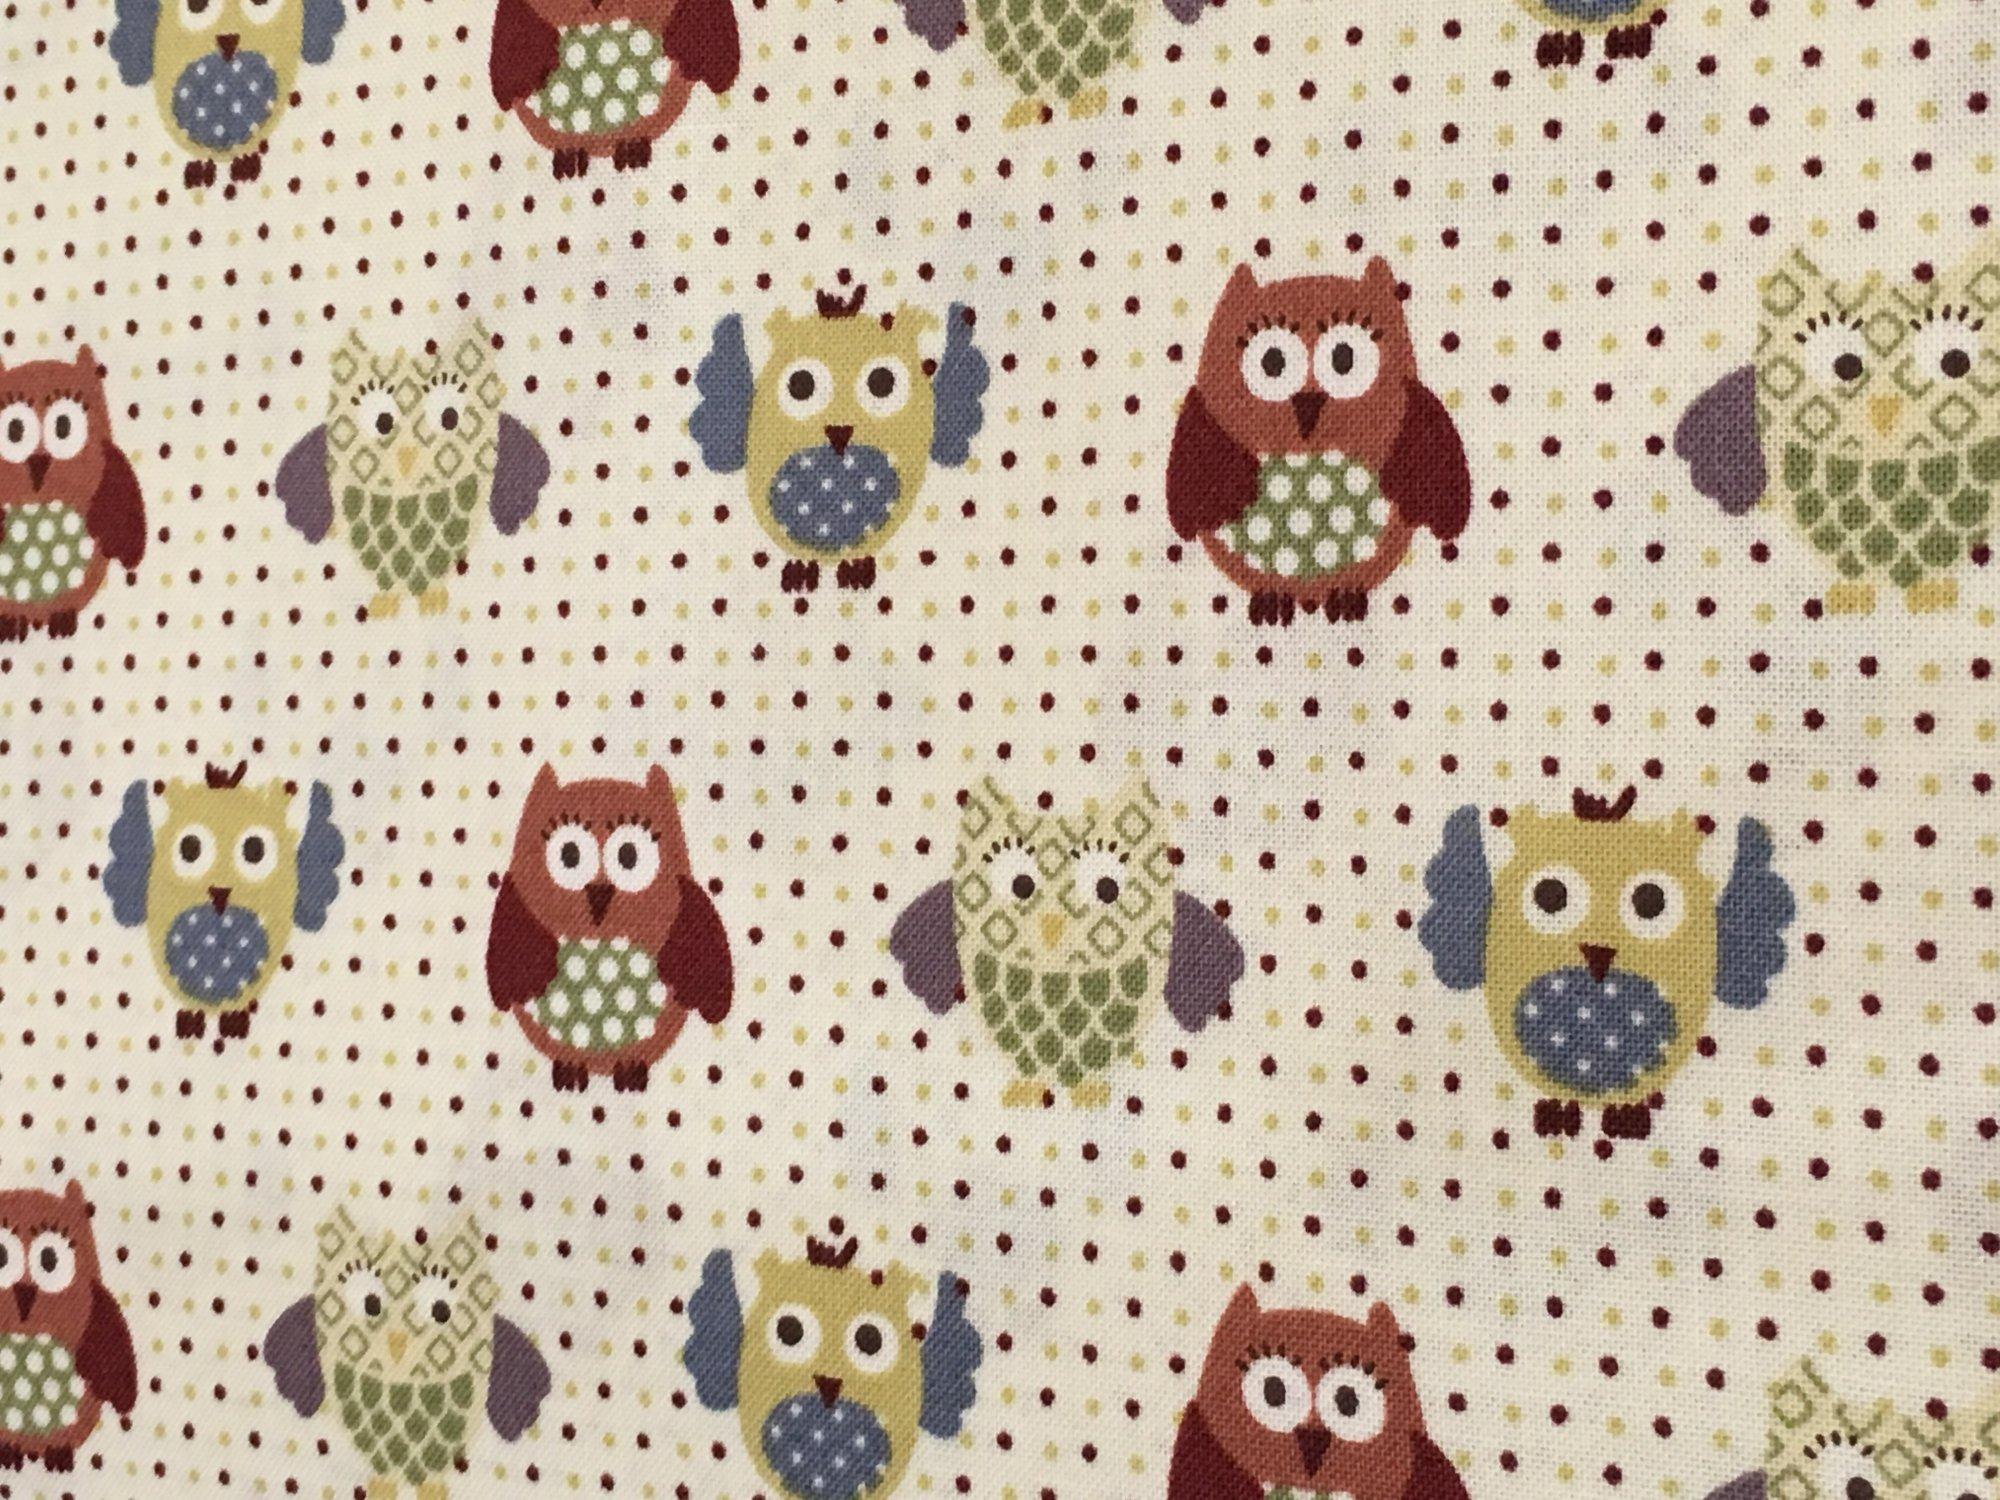 O.B.O.- Owls and dots Beige